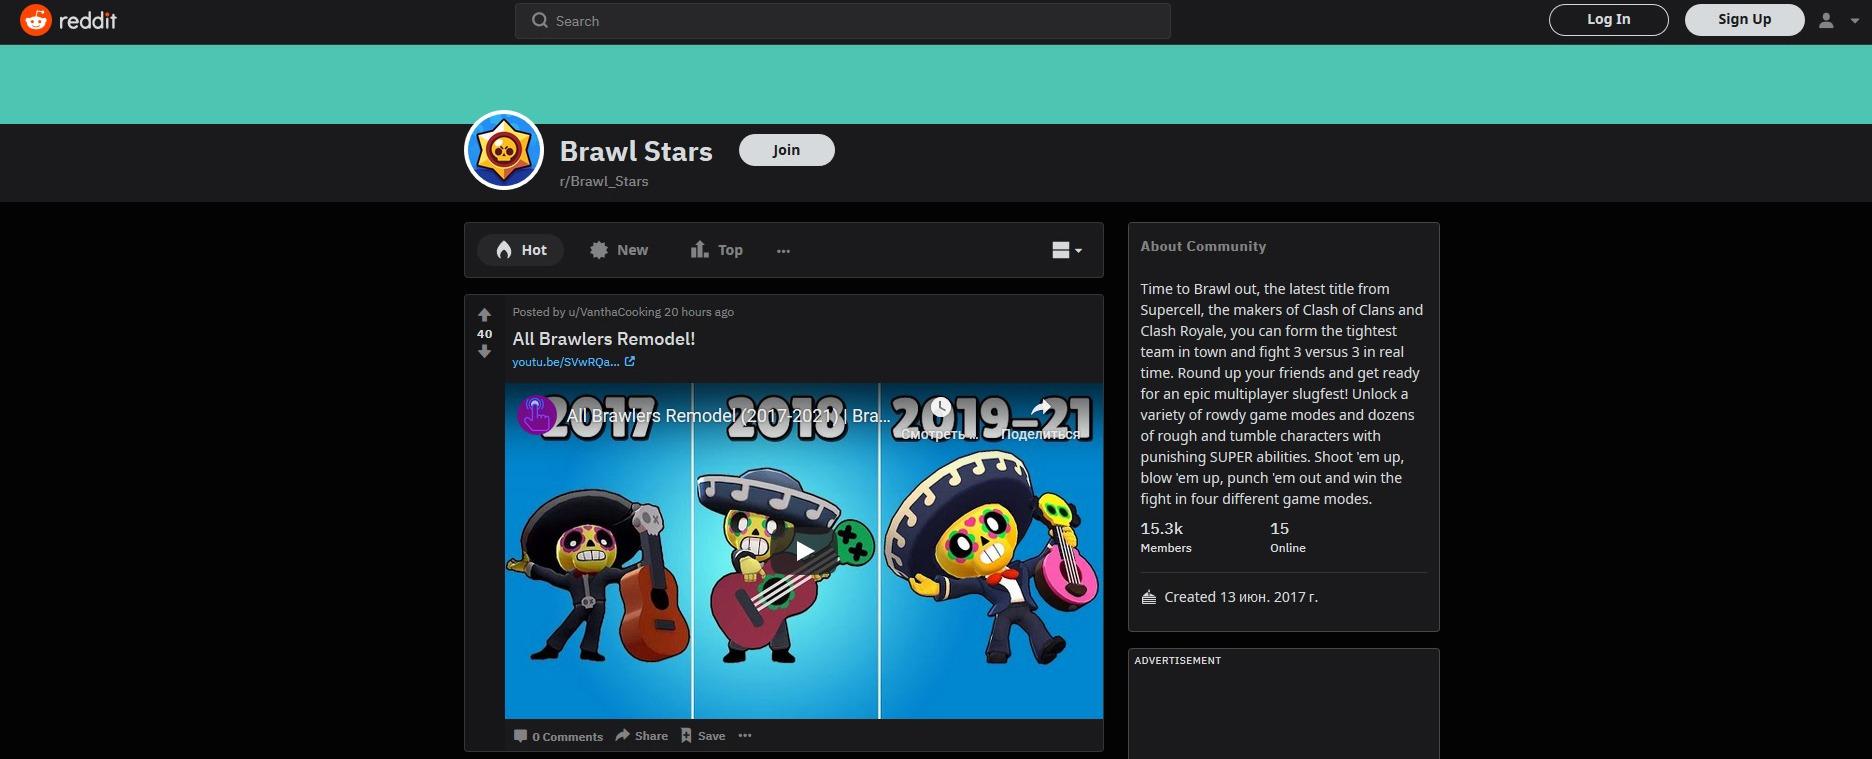 Reddit_Brawl_Stars